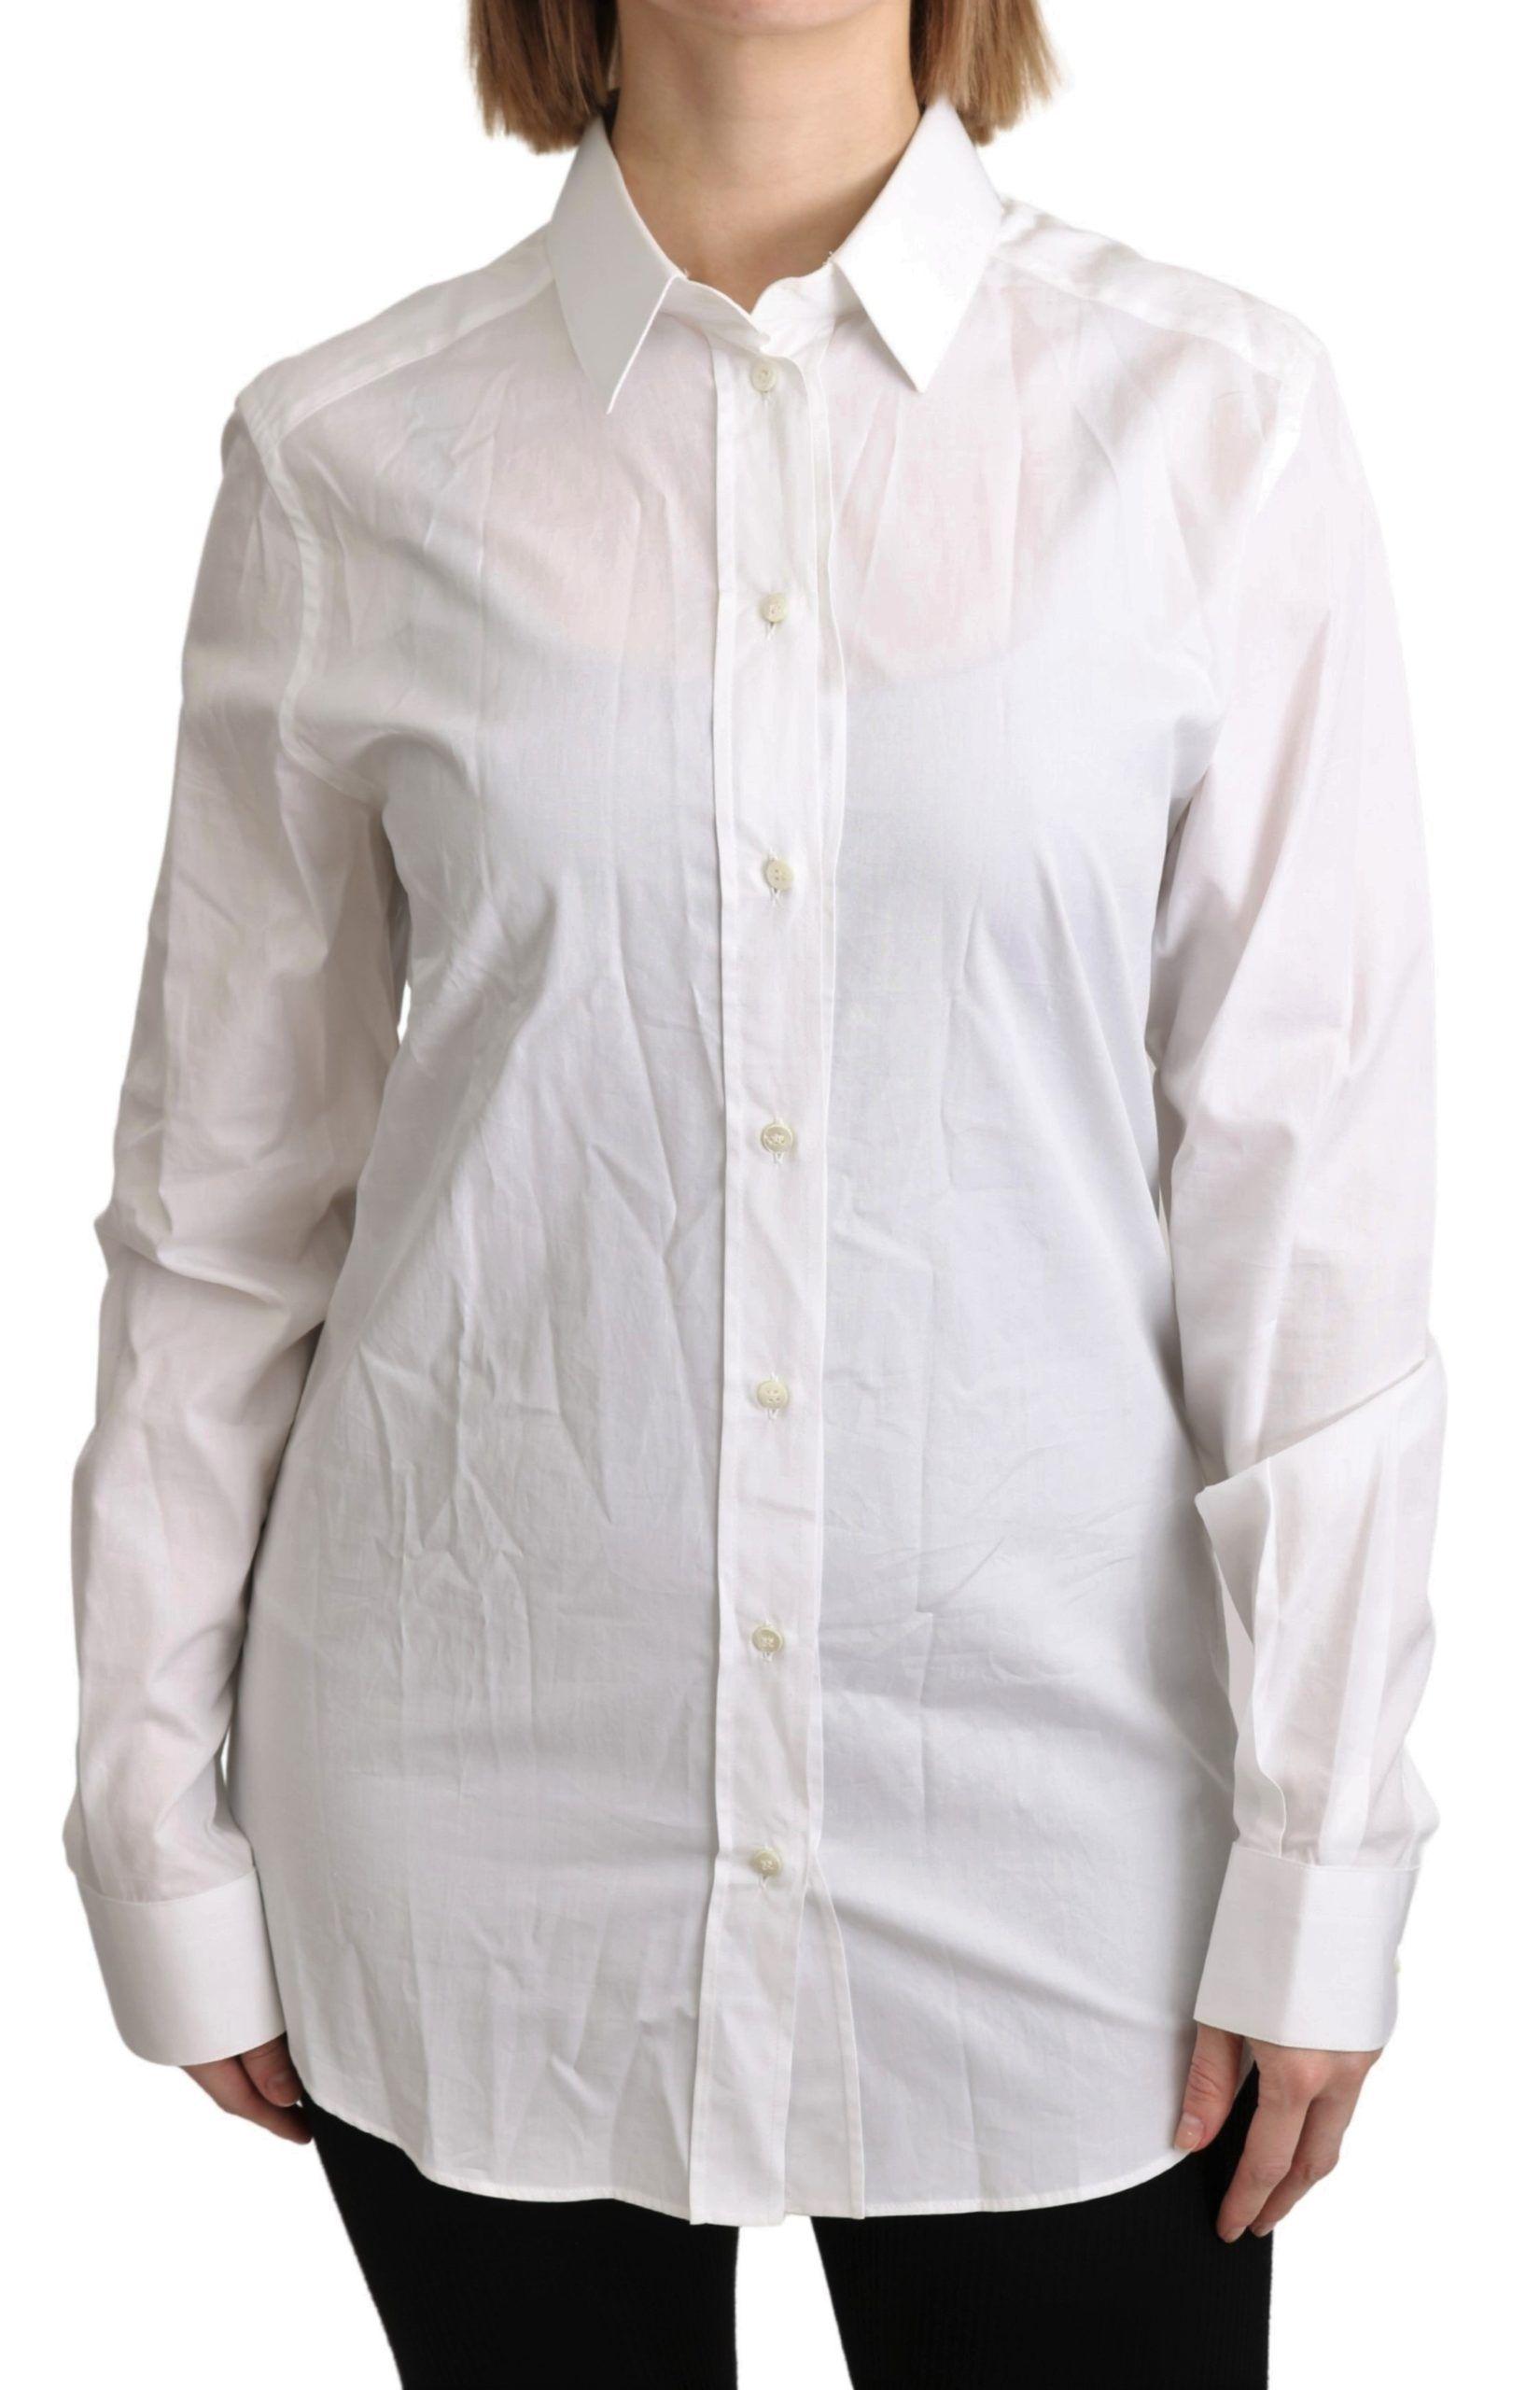 Dolce & Gabbana White Collared Formal Dress Shirt Cotton Top